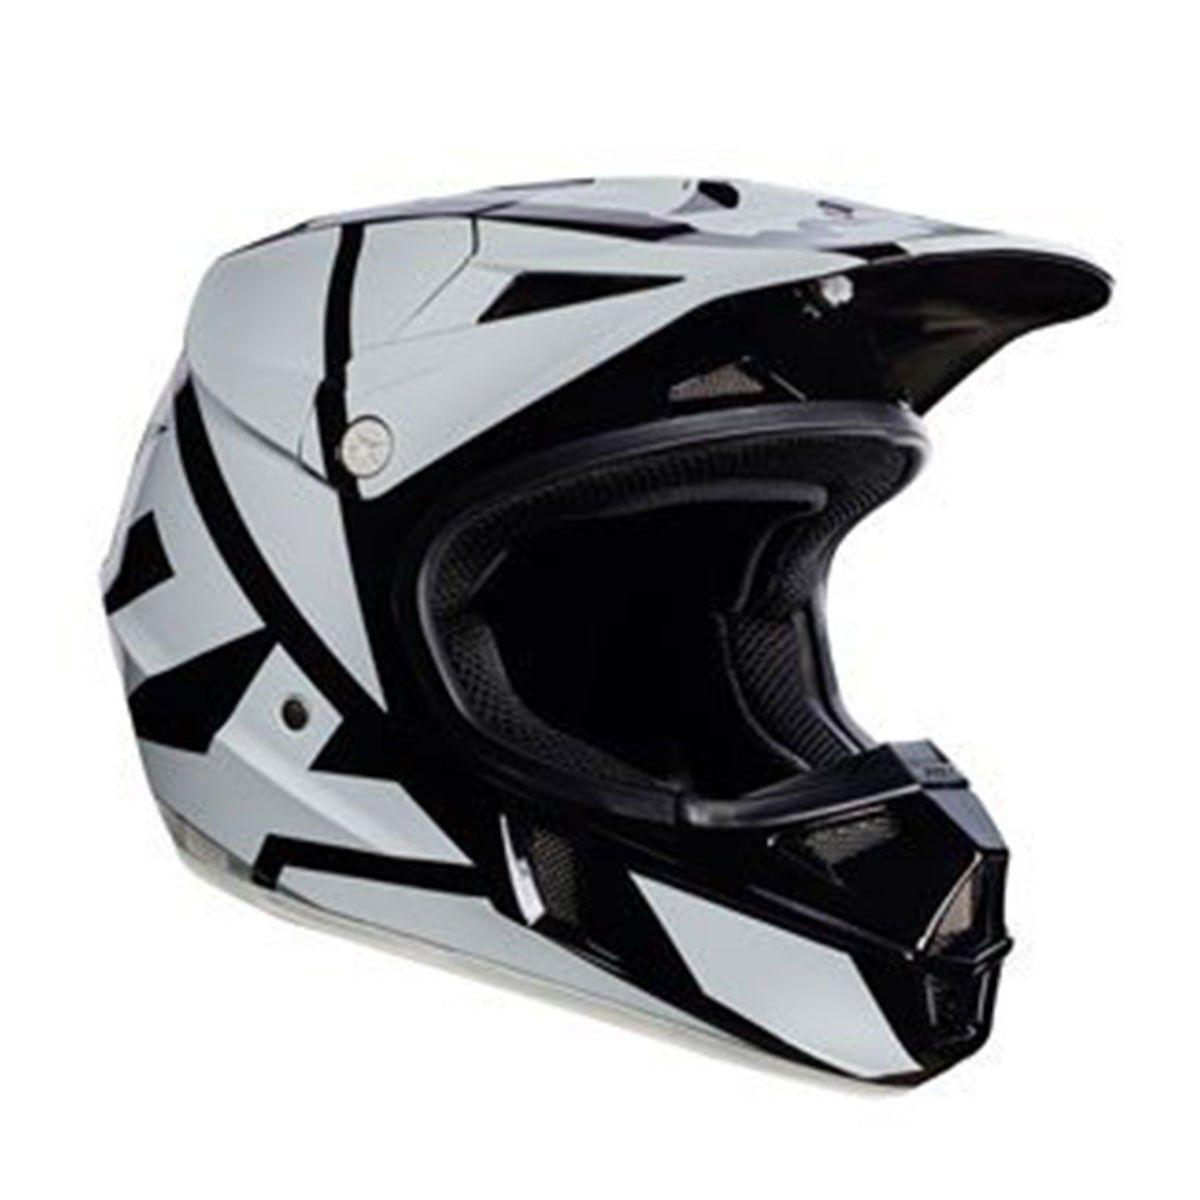 Capacete de Motocross Fox V1 Race Black